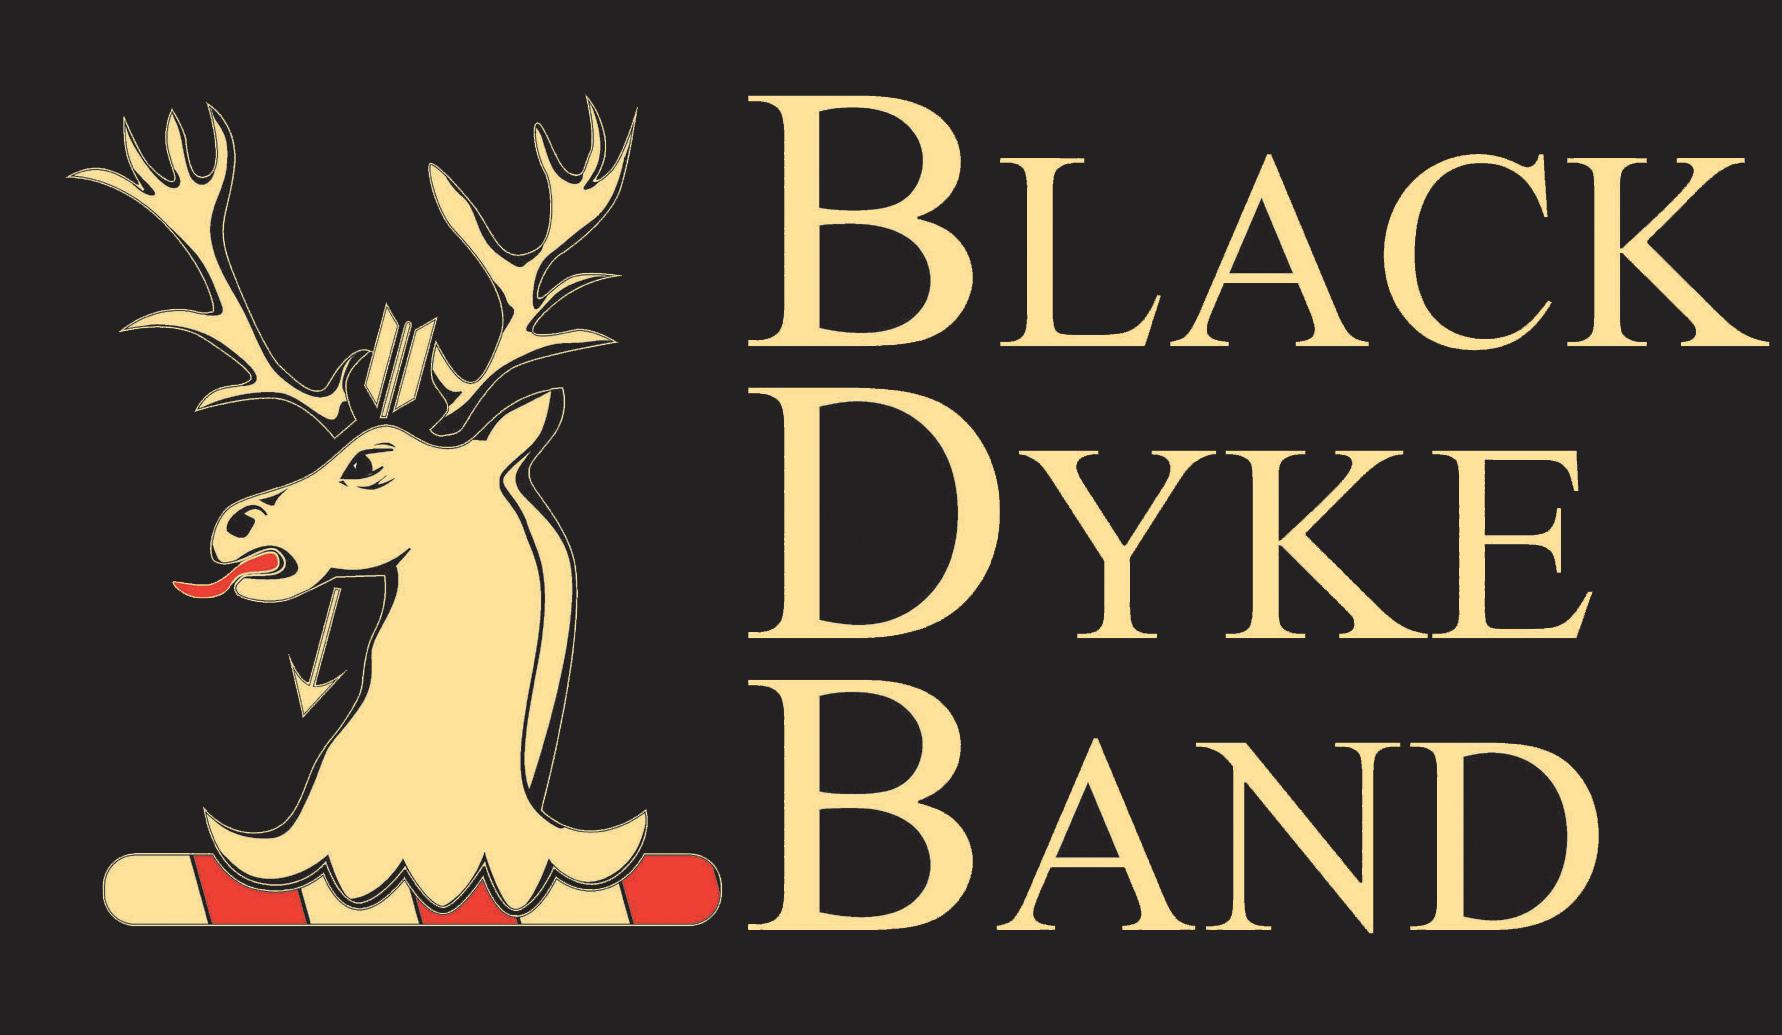 Black Dyke Band Logo 2.jpg